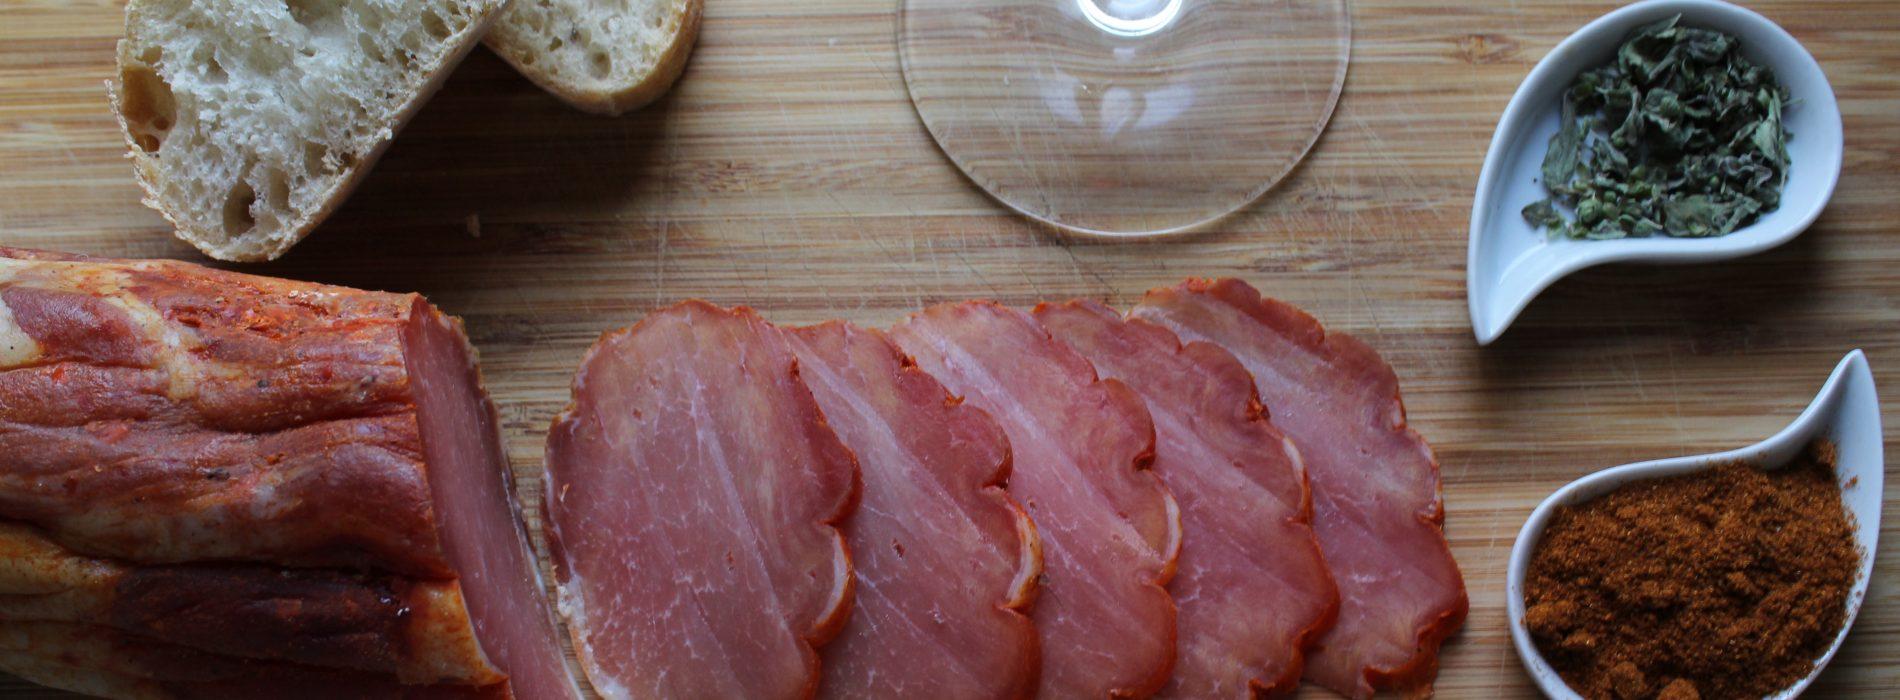 Lomo de cerdo con pimentón